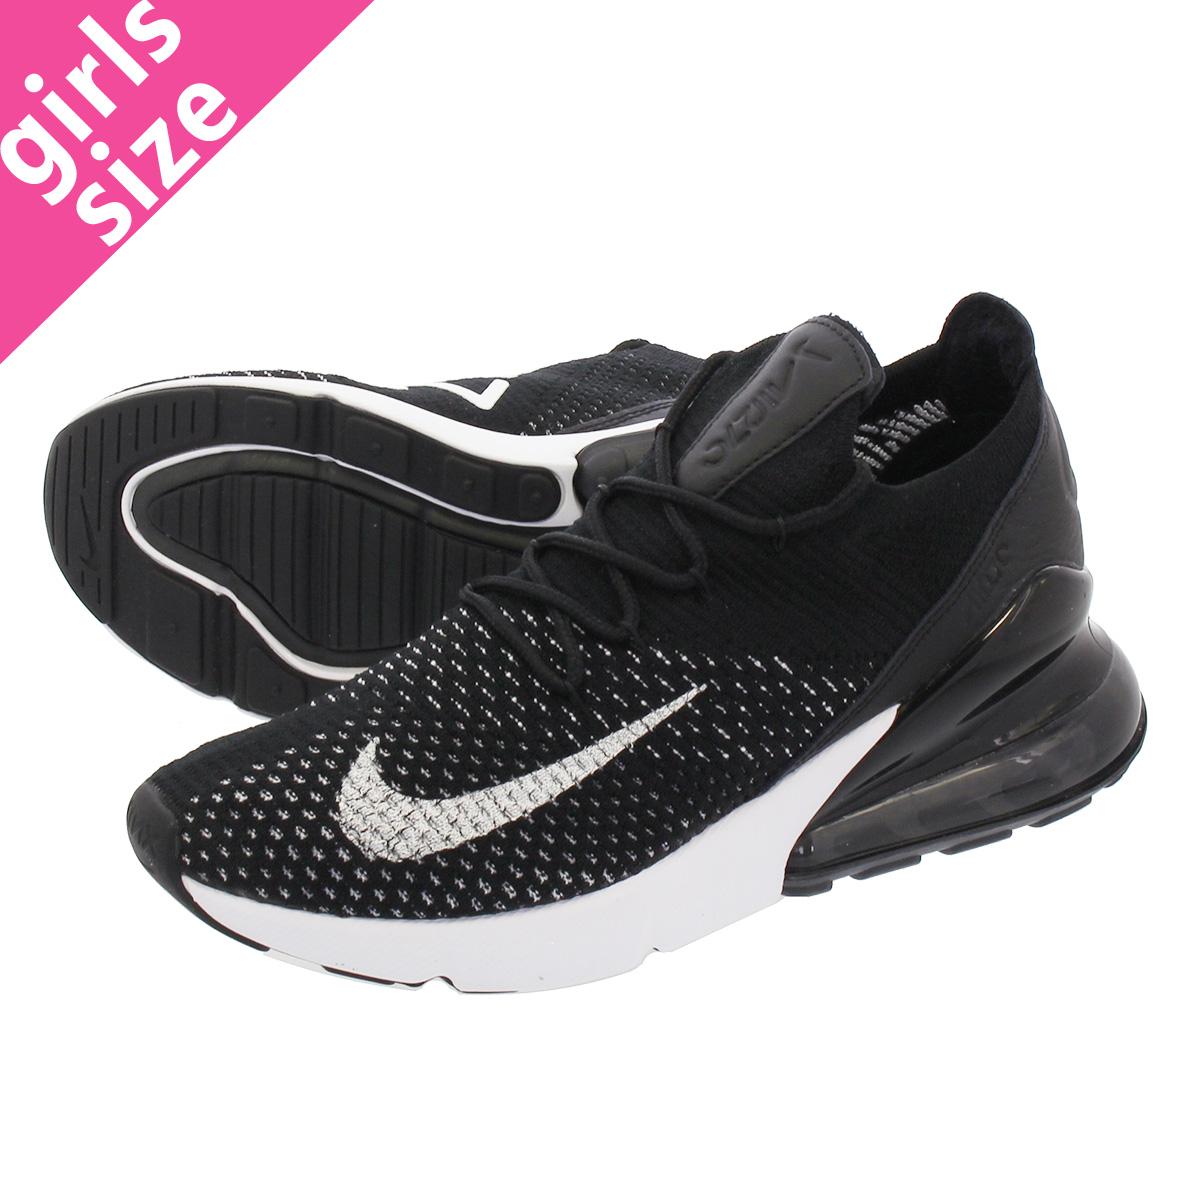 uk availability 4e1cd 2eb4d NIKE WMNS AIR MAX 270 FLYKNIT Nike women Air Max 270 fried food knit  BLACK/WHITE